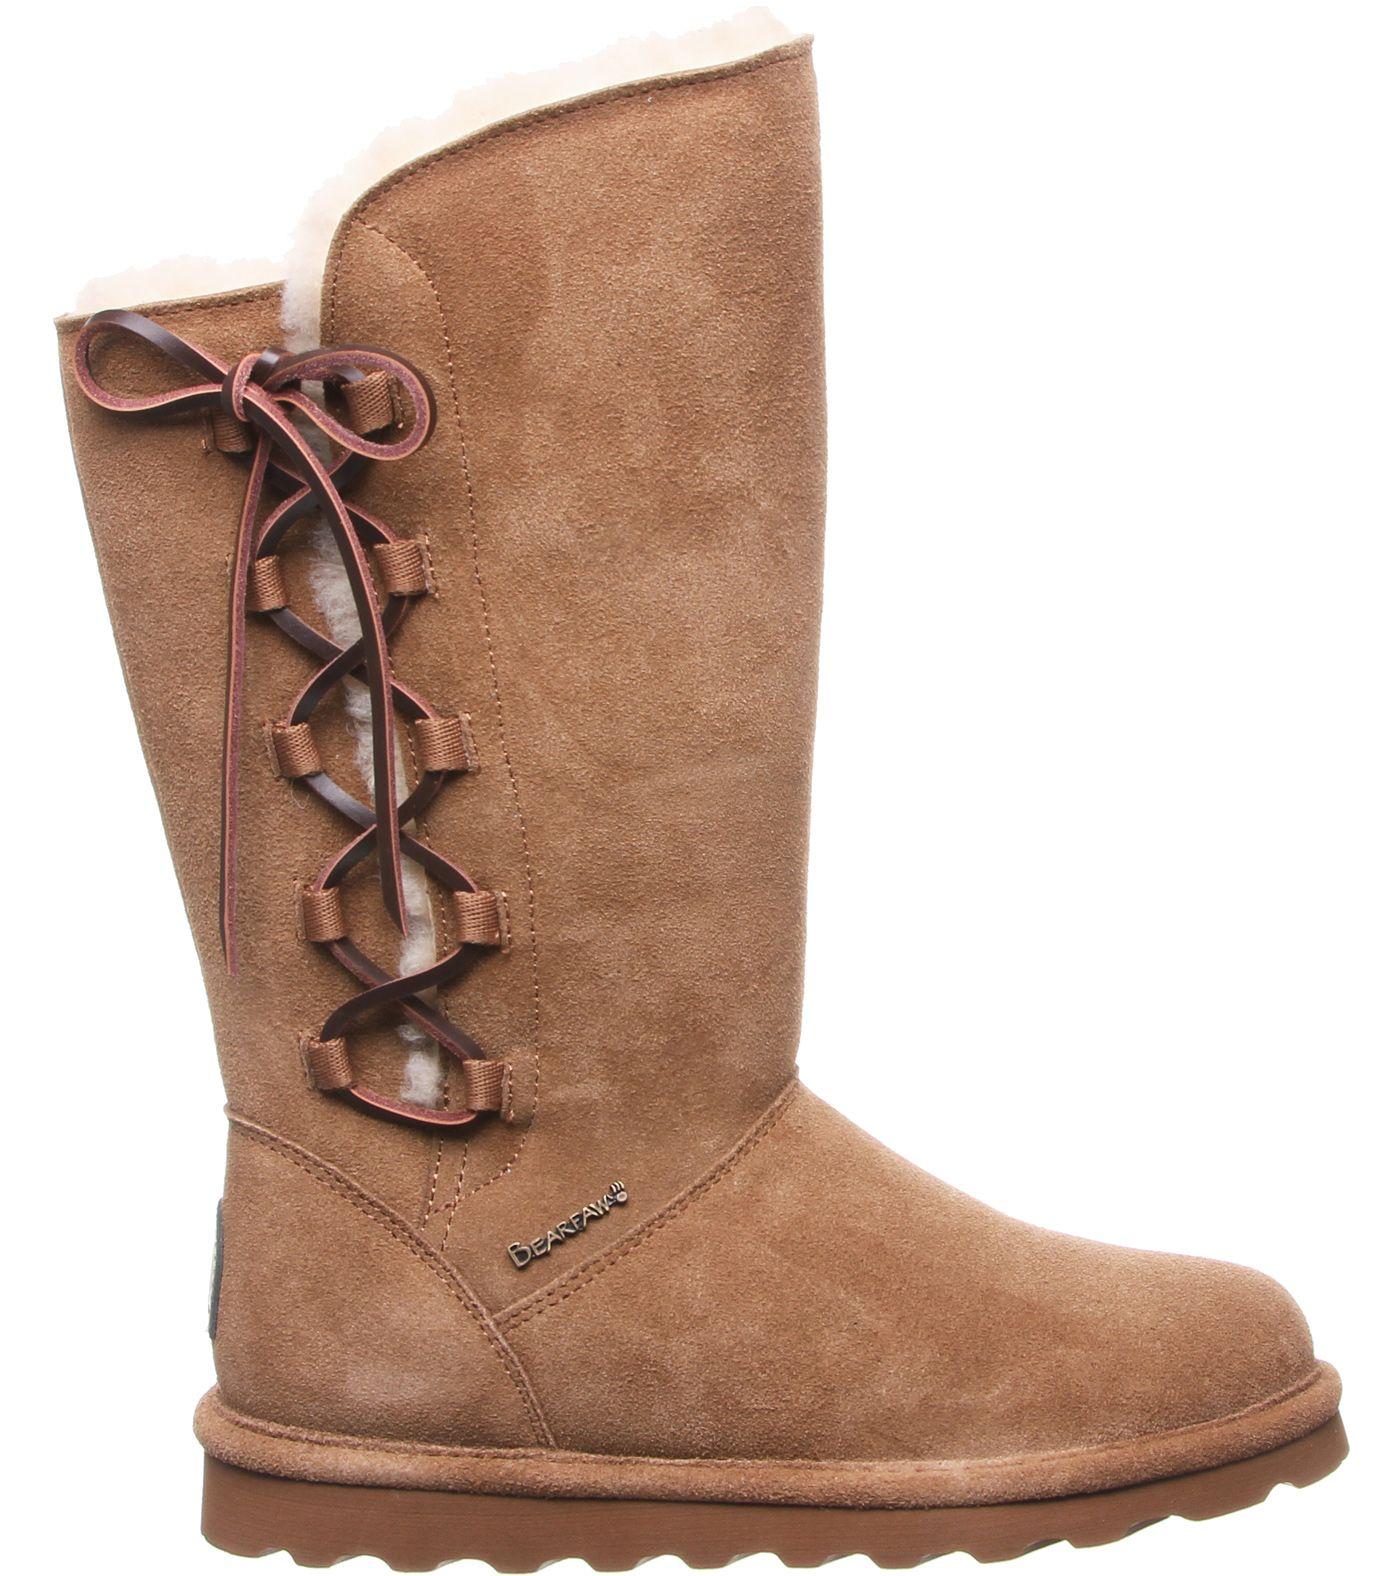 BEARPAW Women's Rita Winter Boots